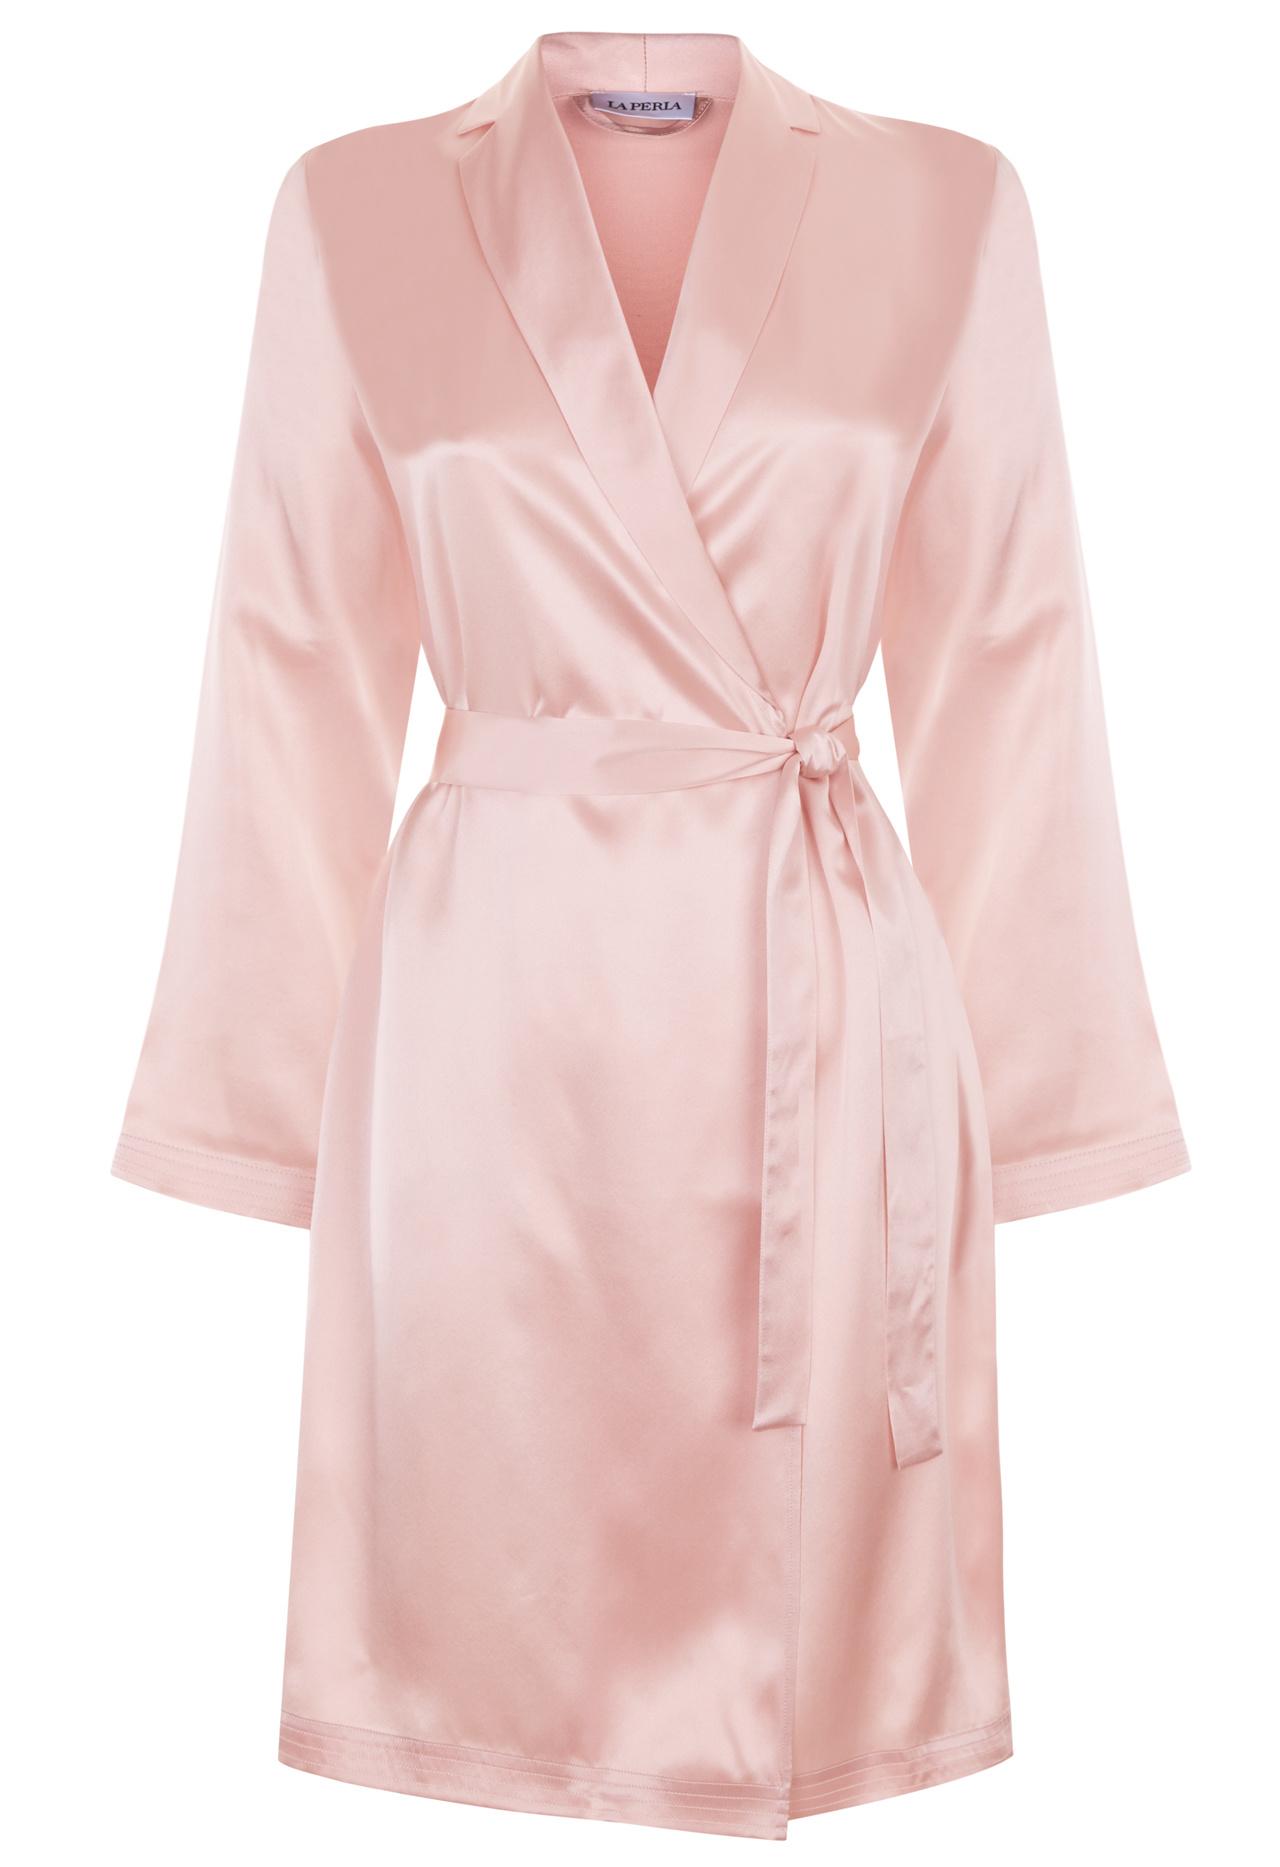 Silk Silk Satin Short Robe | La Perla